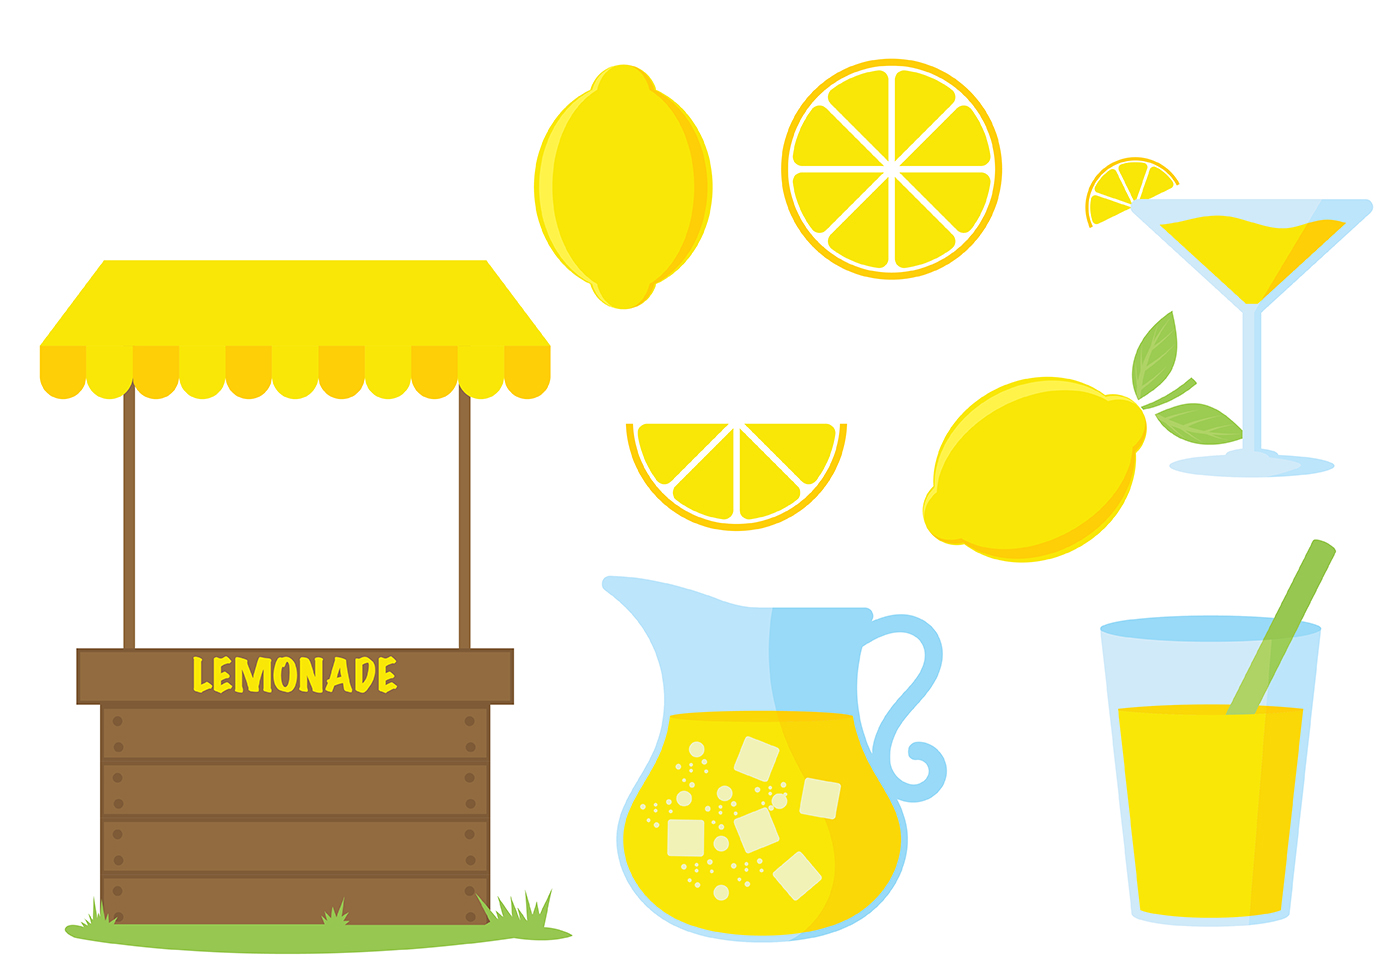 Lemonade Stand Vector Icon Download Free Vector Art